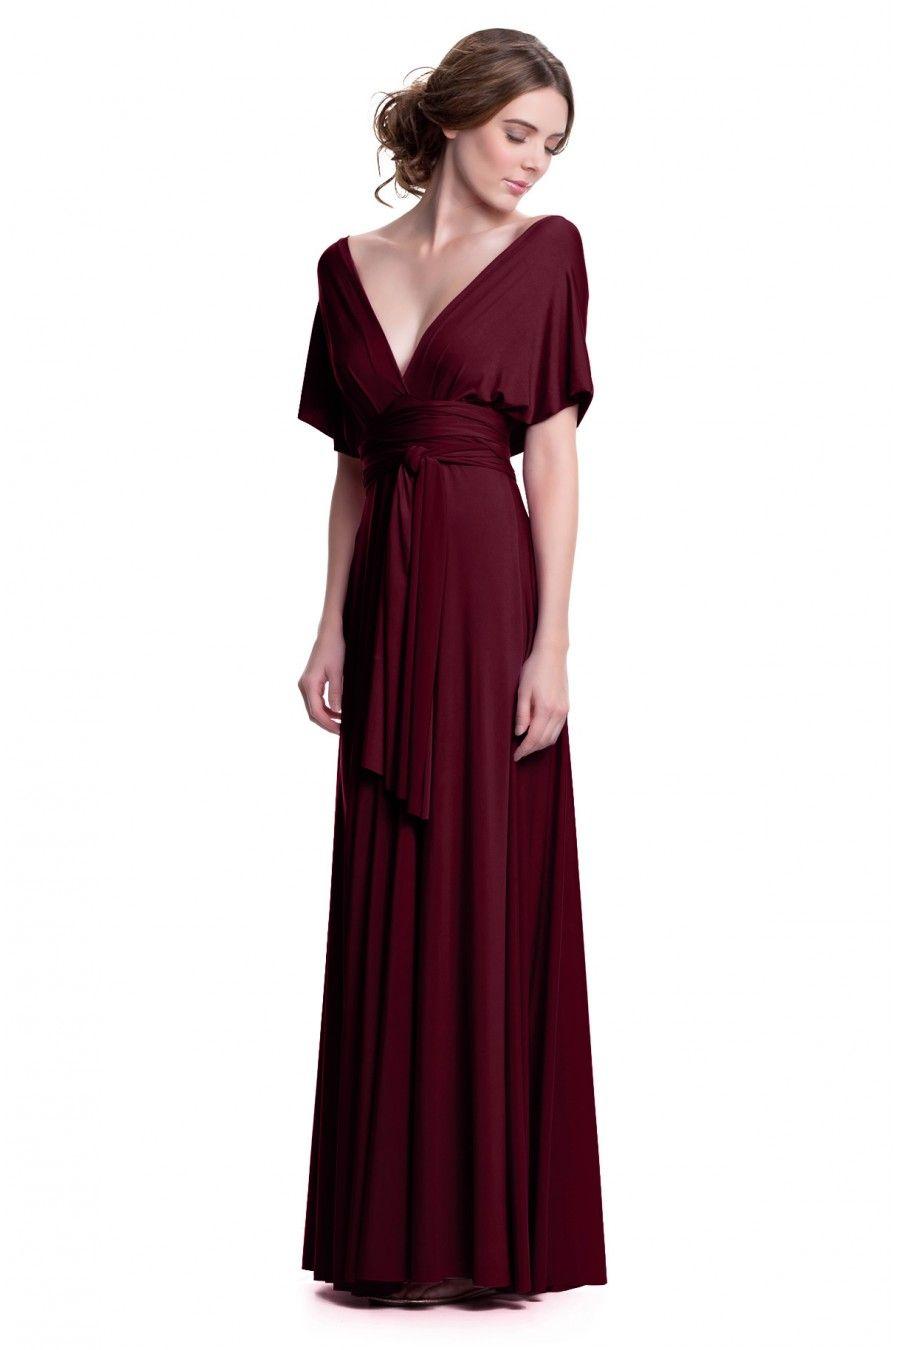 Sakura Maxi Convertible Dress | Burgundy wine